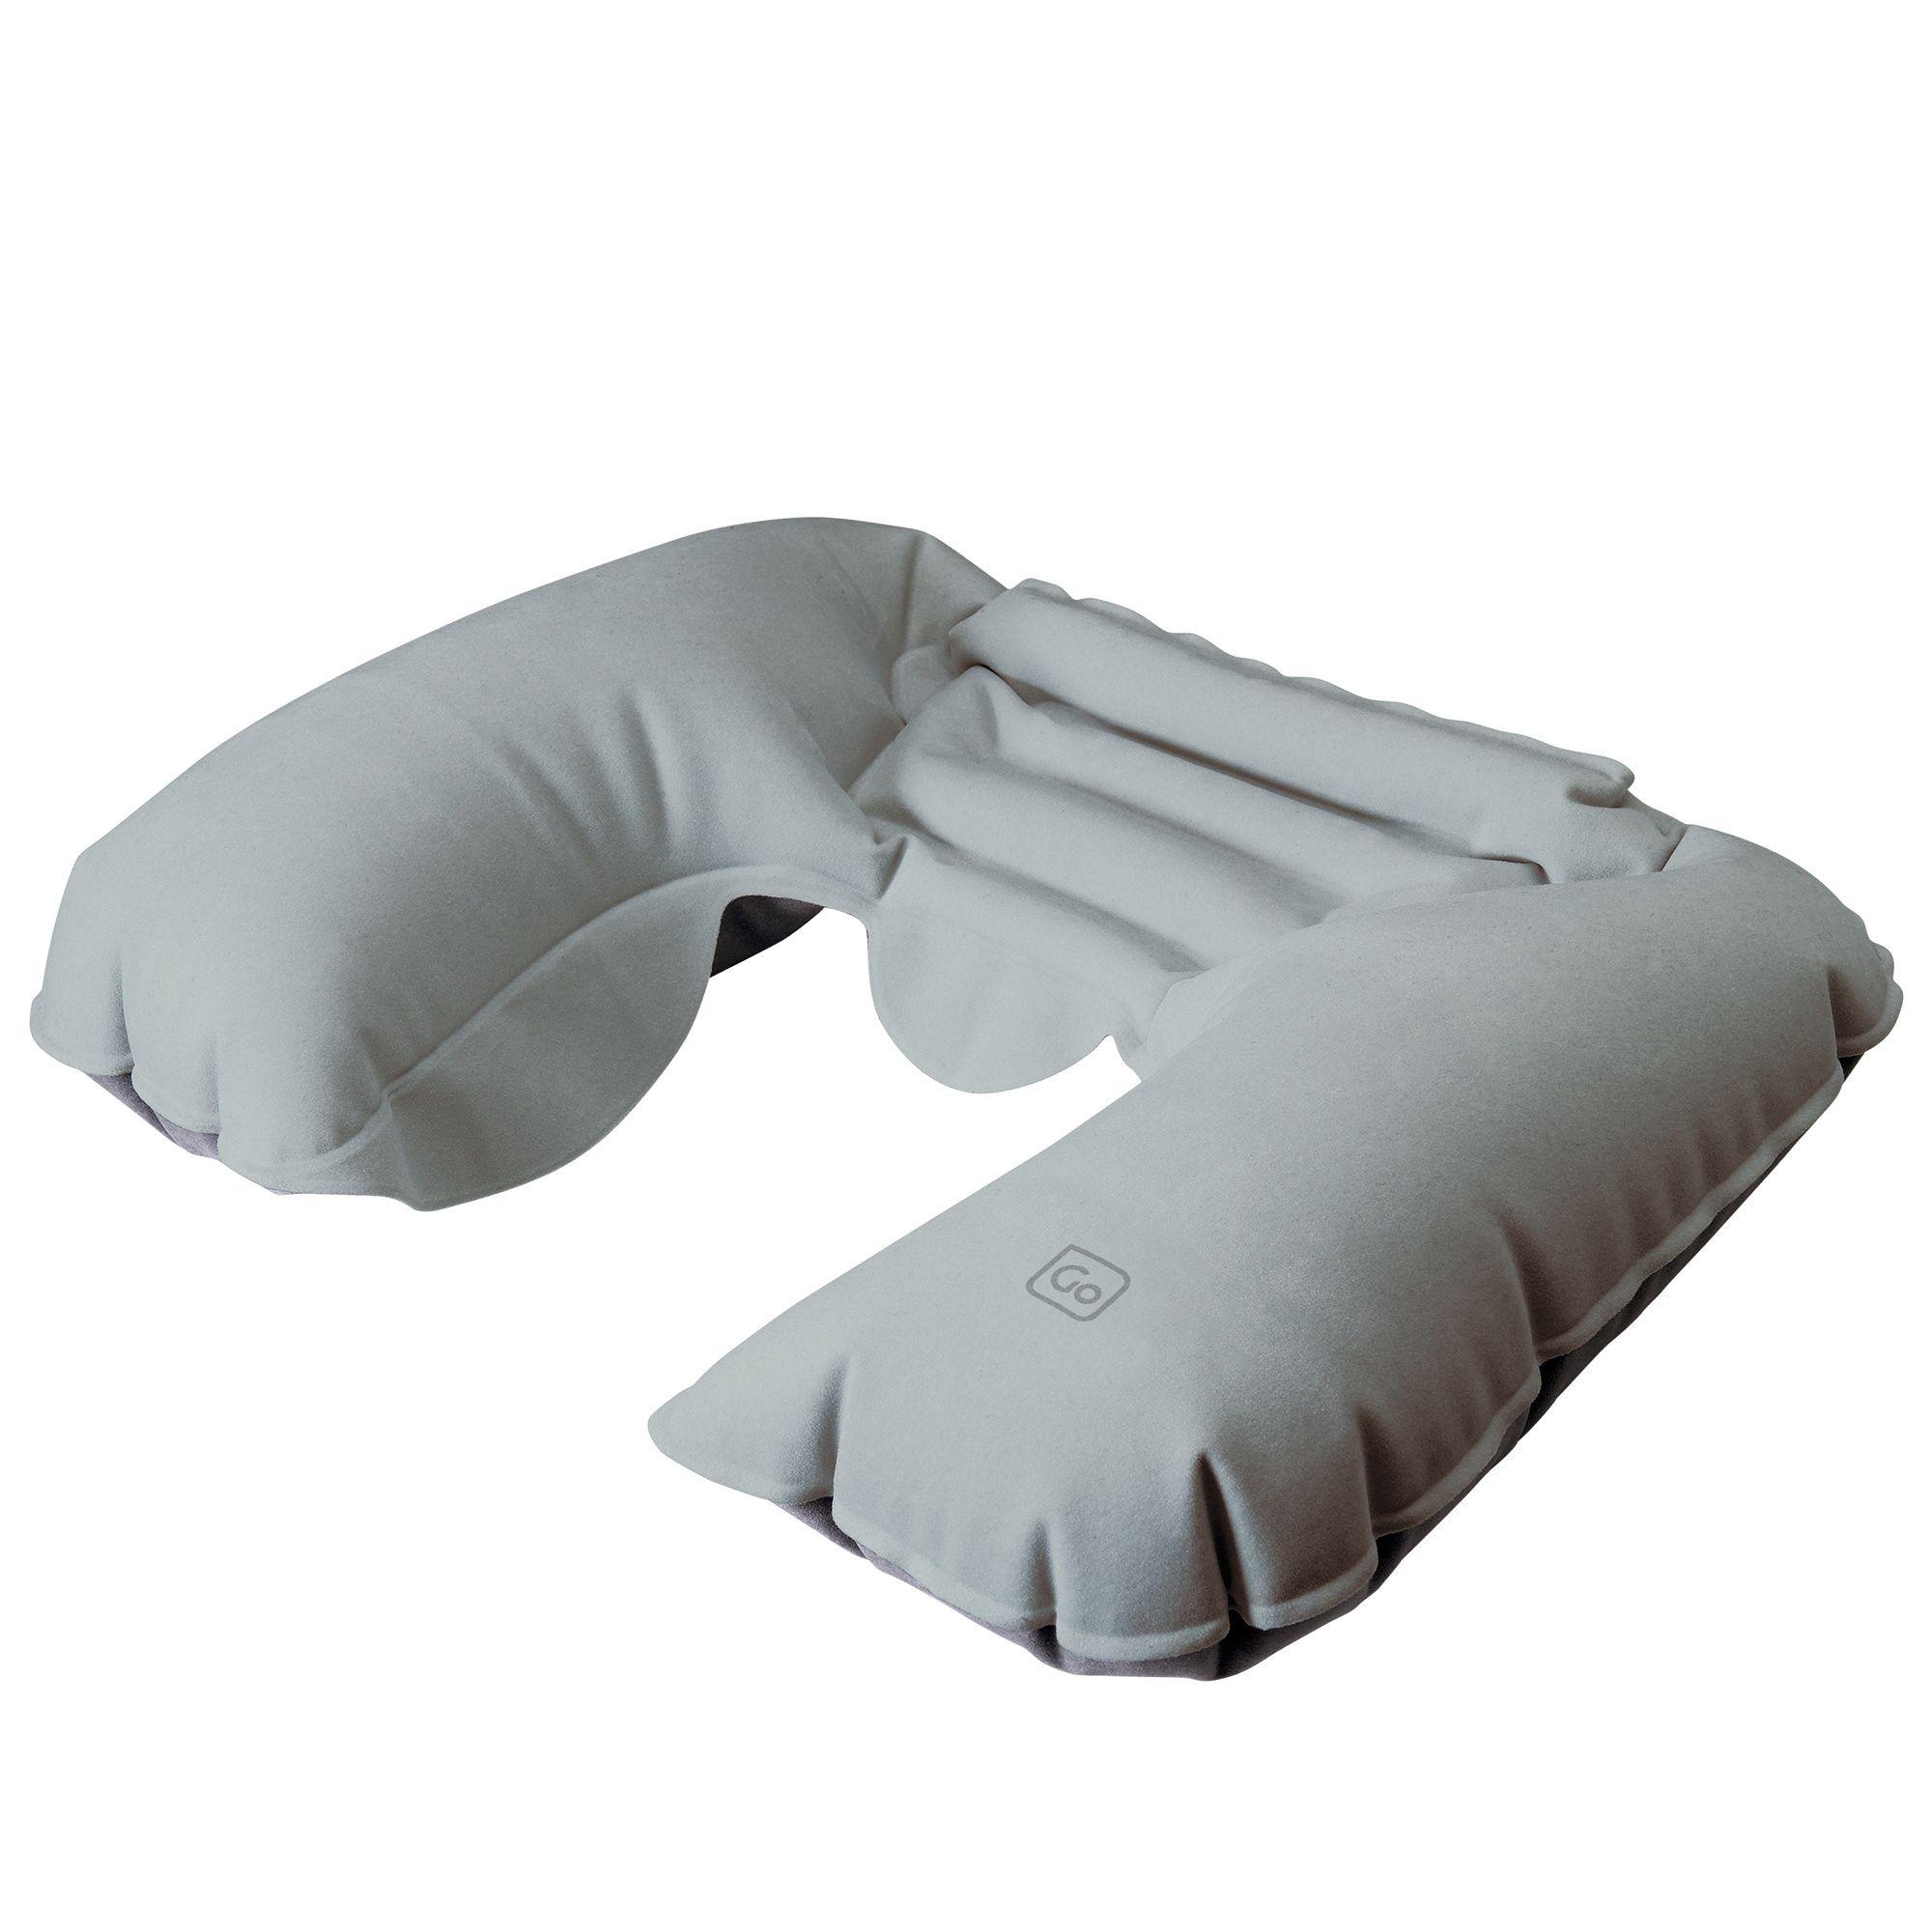 DESIGN GO The Snoozer Travel Pillow